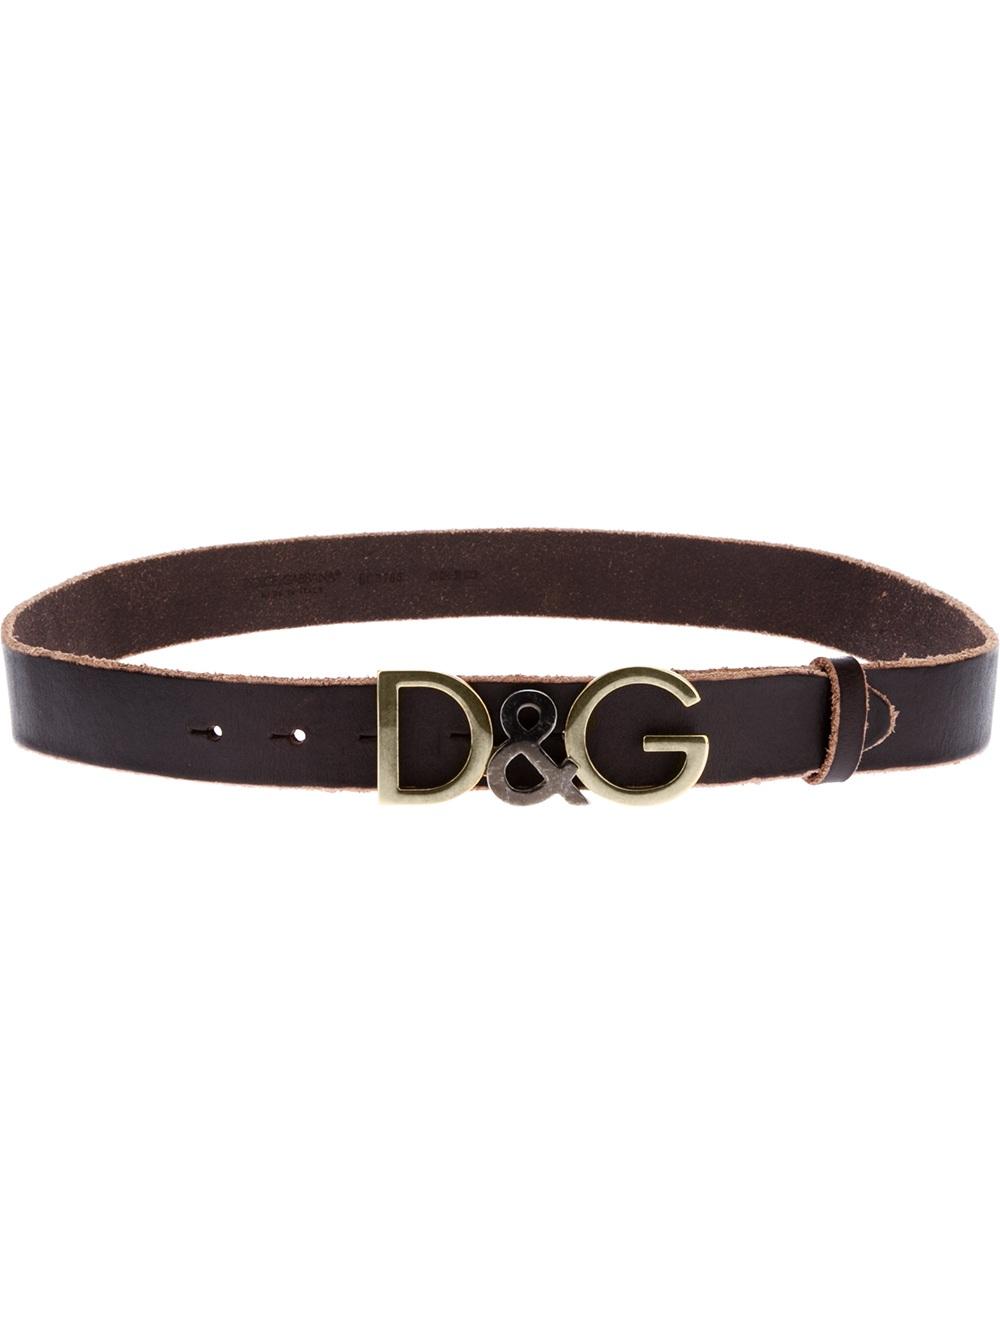 a1f1ac36 ... aliexpress dolce gabbana logo belt in brown for men lyst 43e70 03030